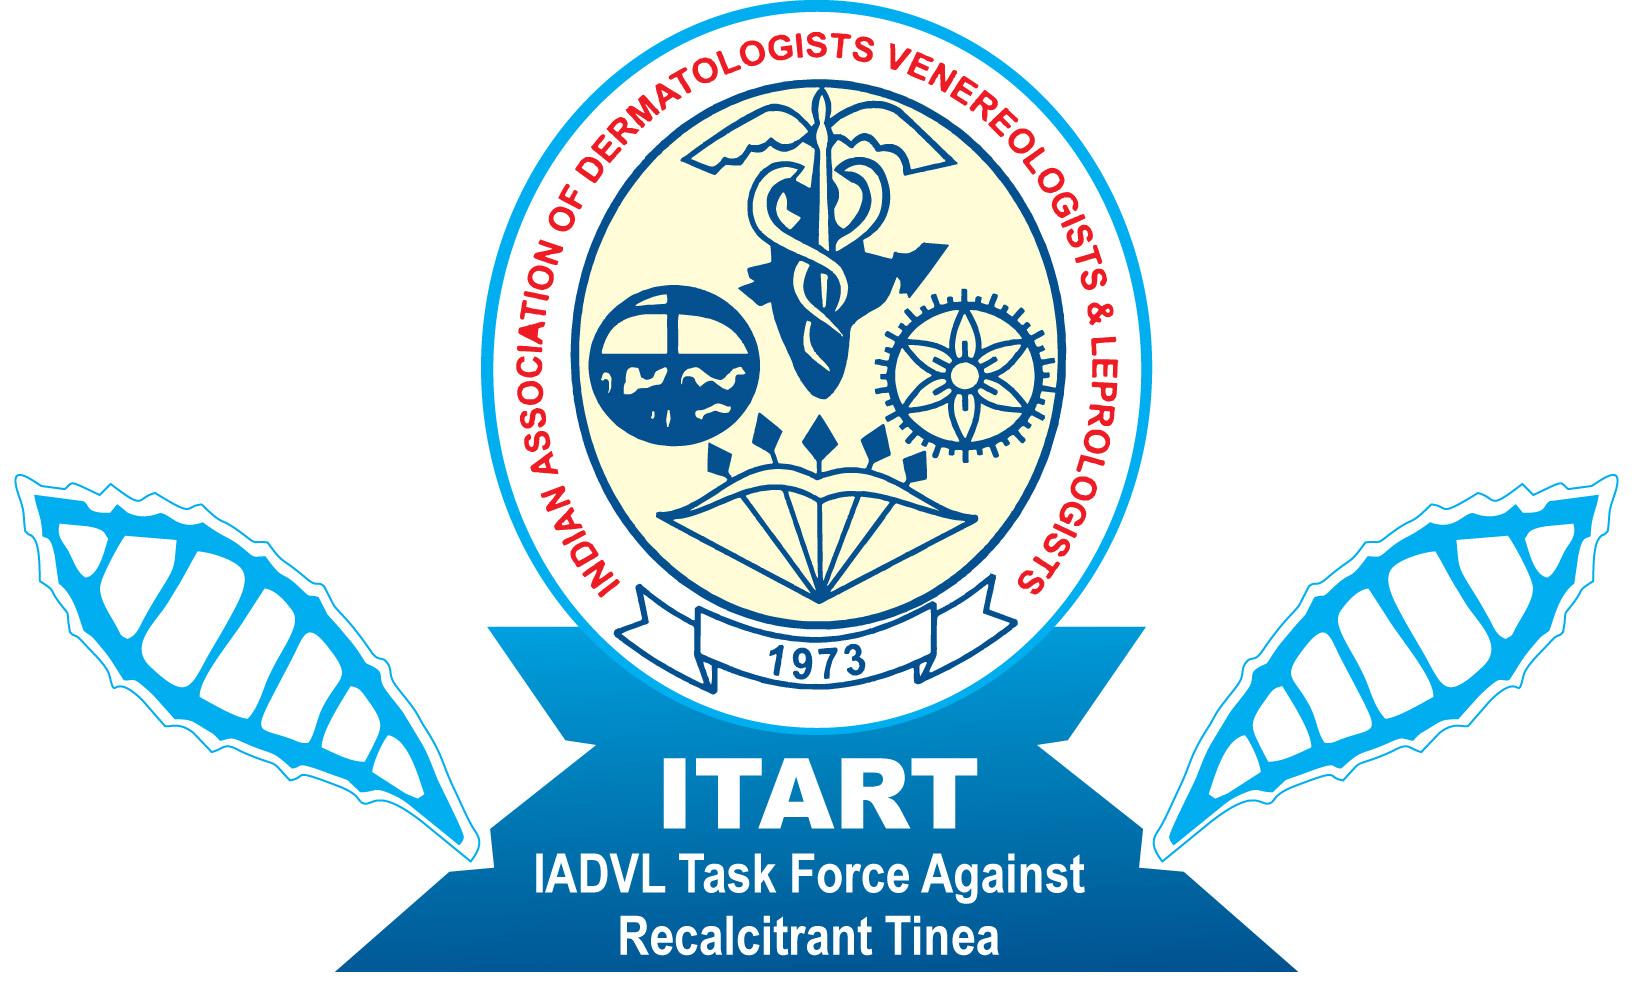 IADVL - Indian Association of Dermatologists, Venereologists